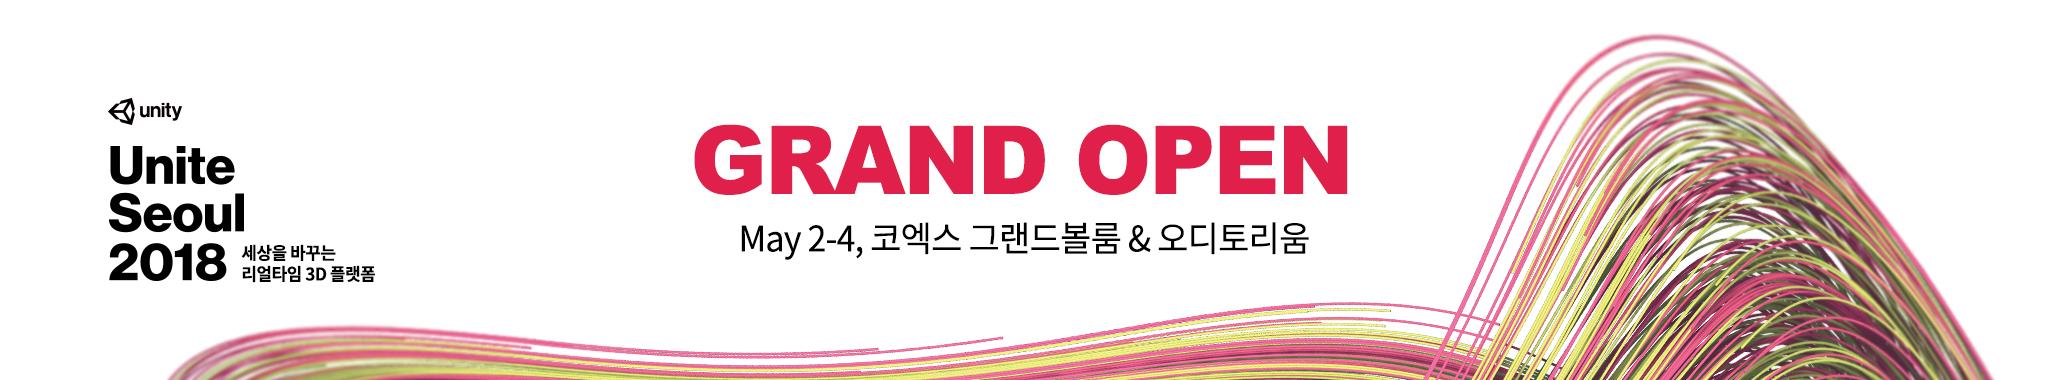 Unite Seoul 2018